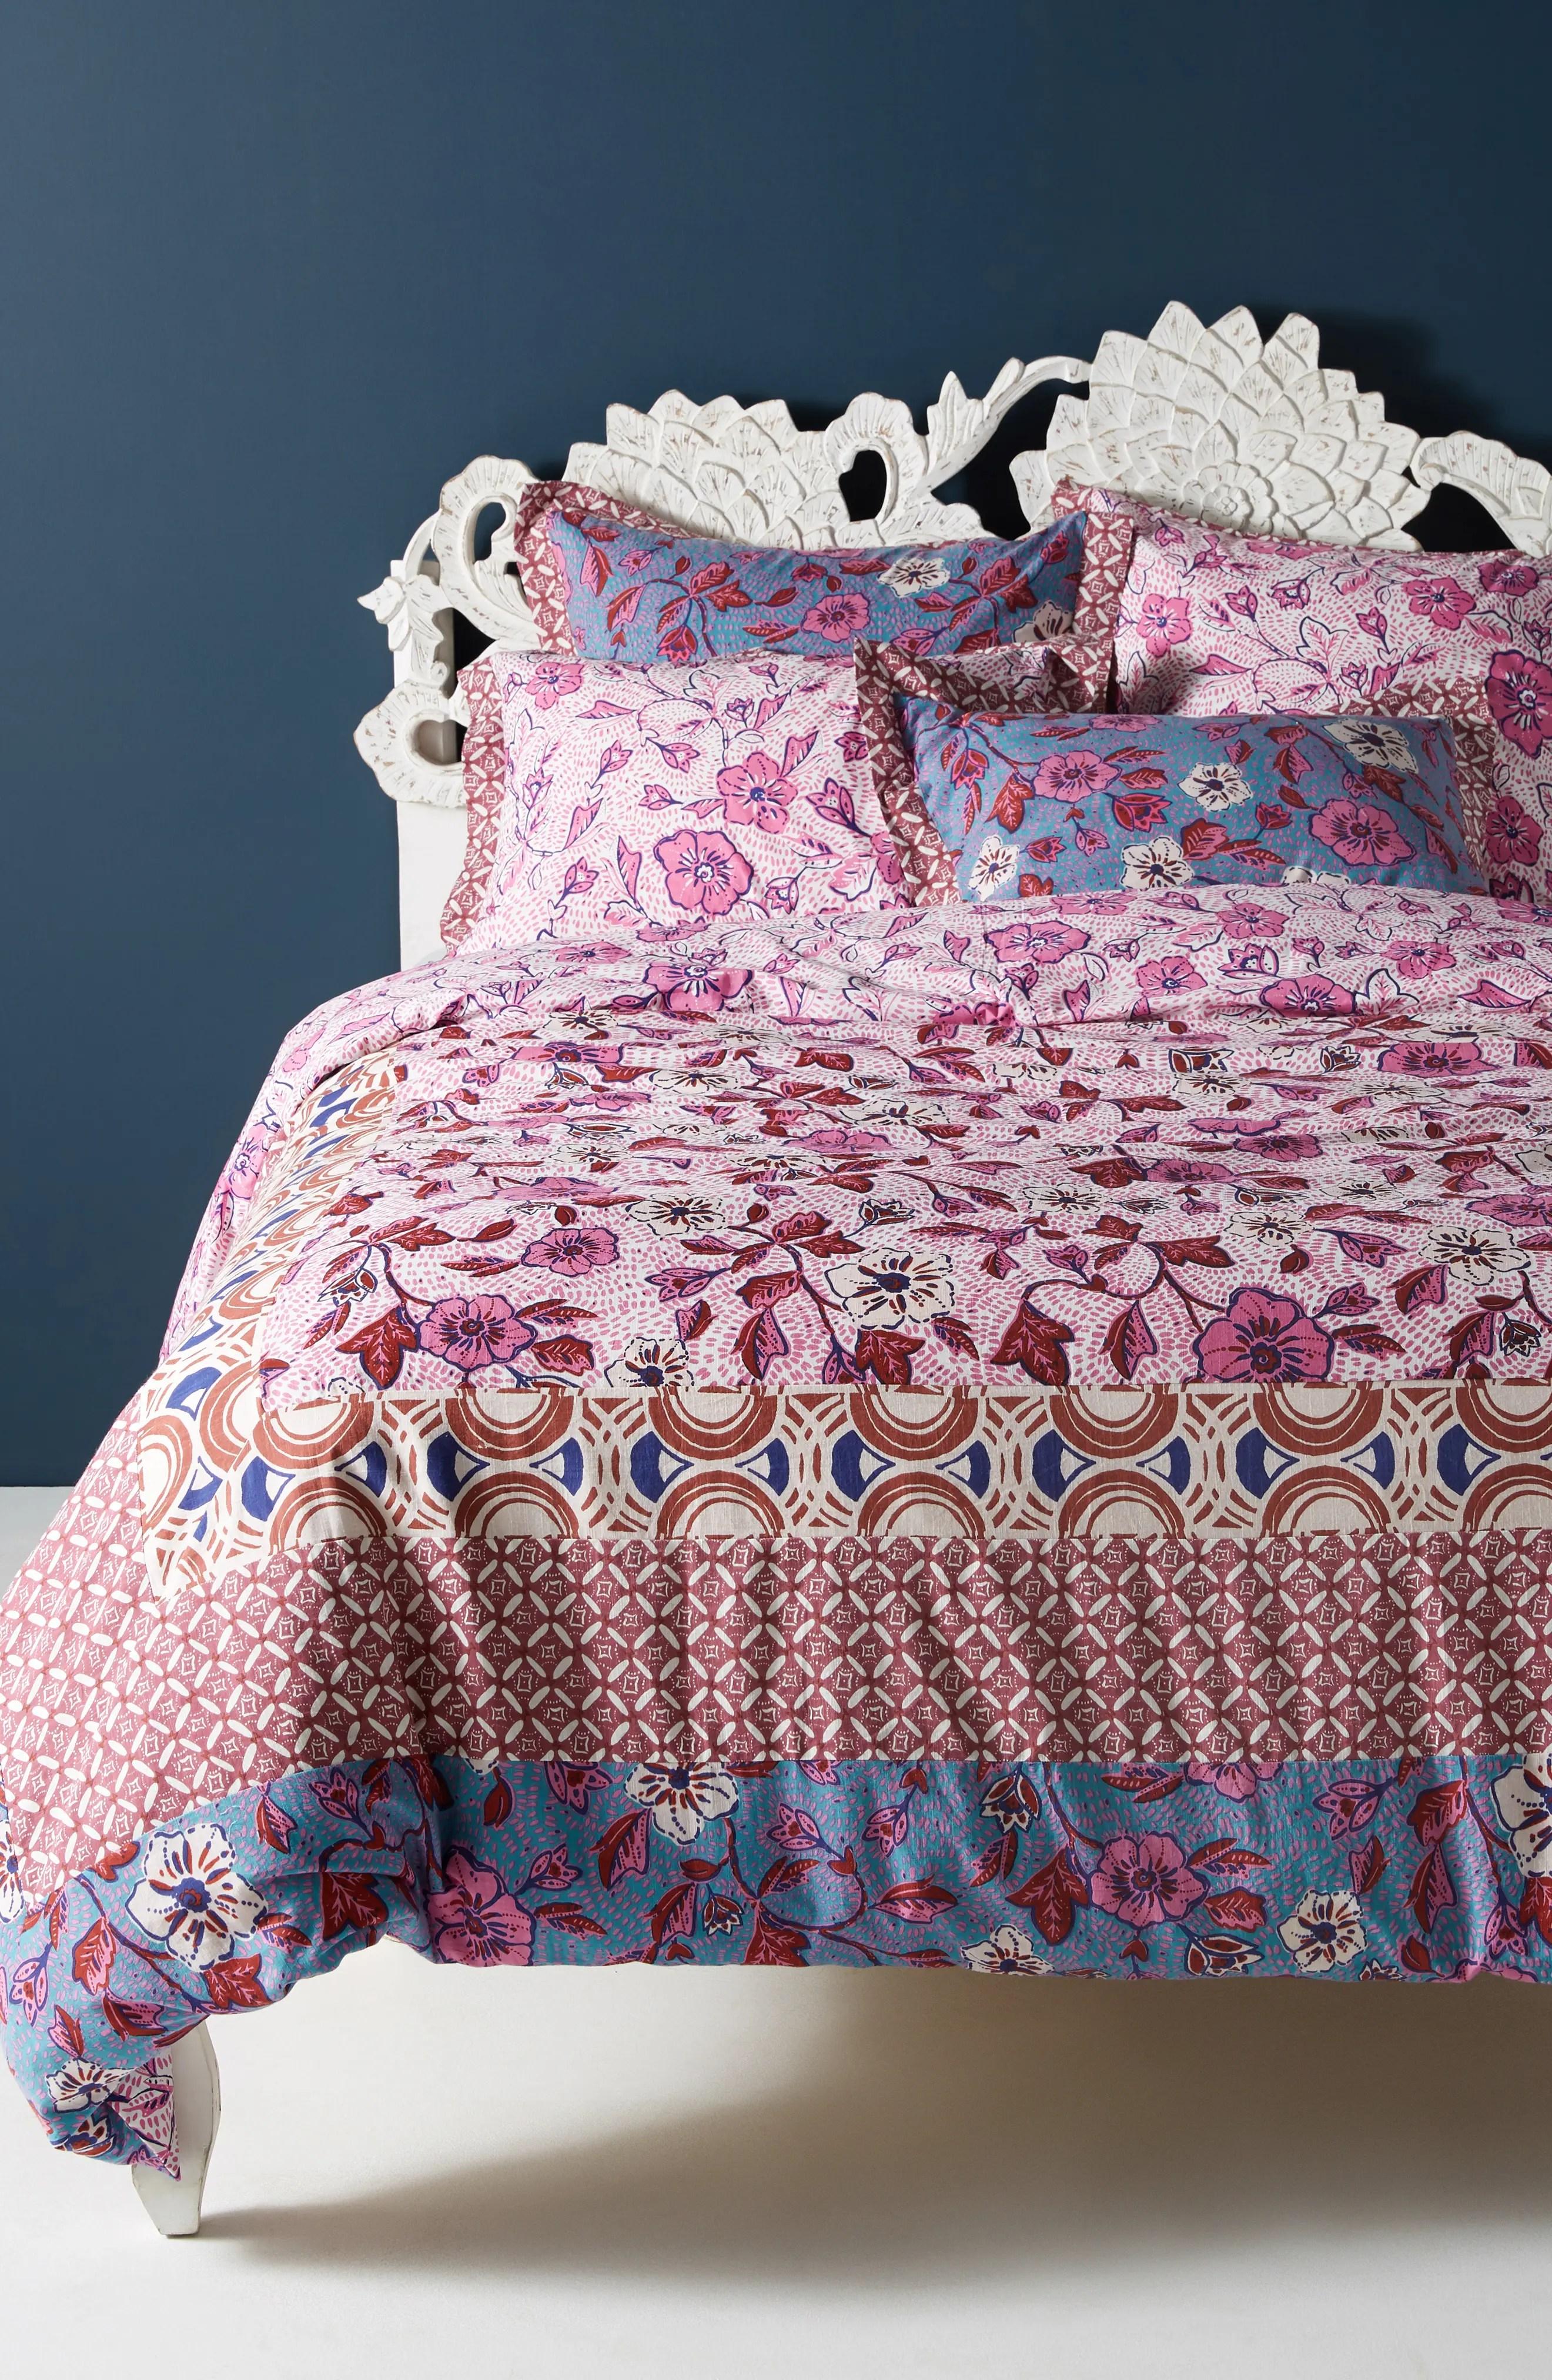 modern art chair covers and linens lexmod edge office duvet pillow shams nordstrom anthropologie zola cover